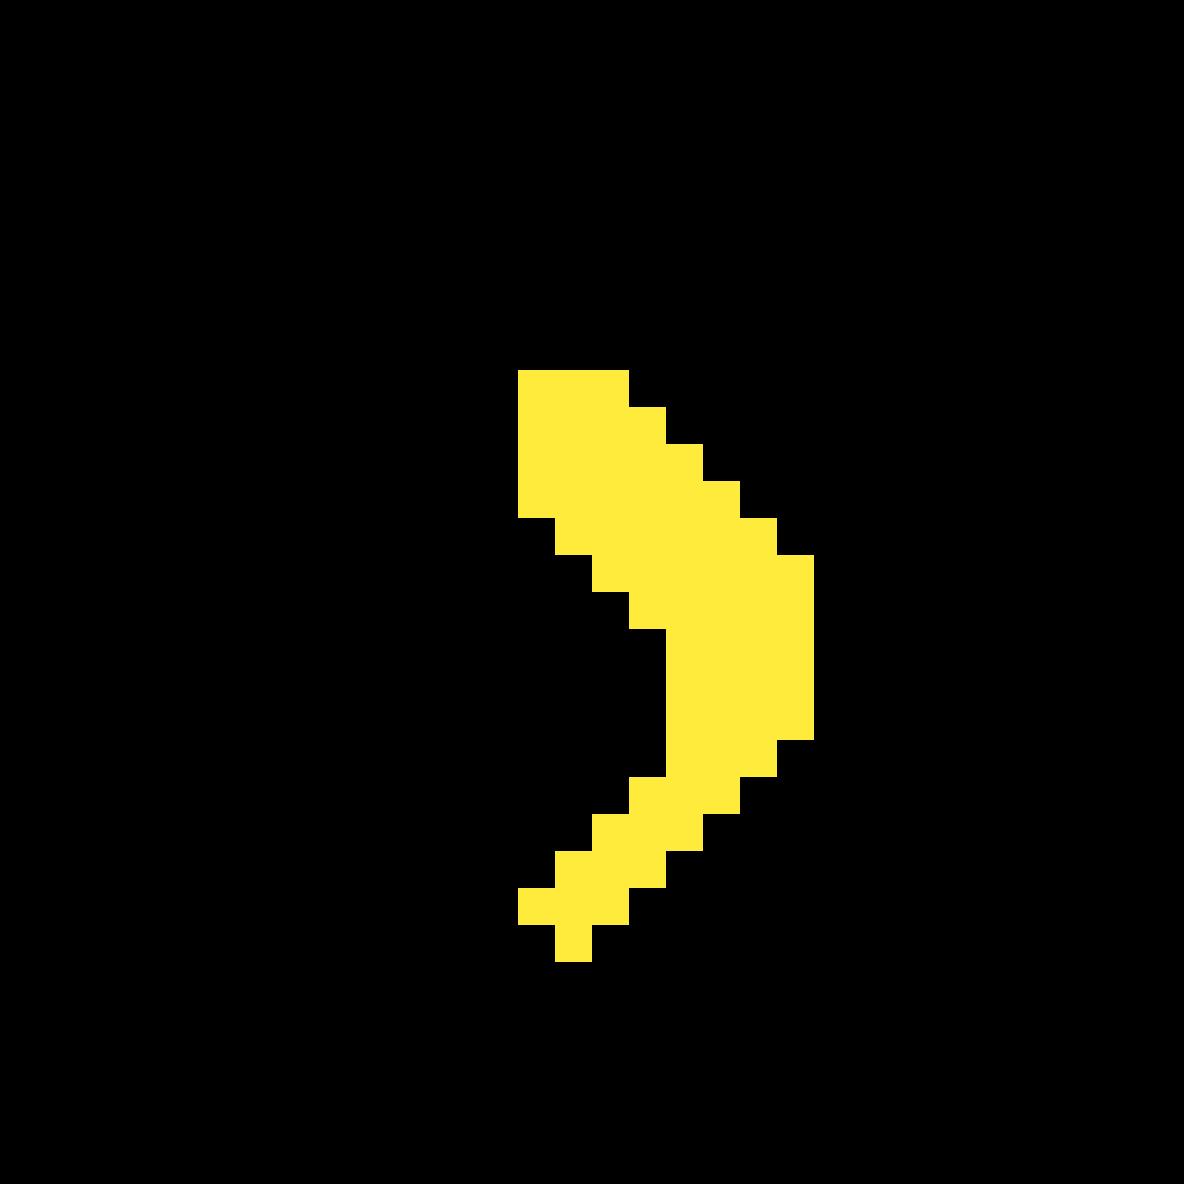 main-image-Banana  by Kenneth3